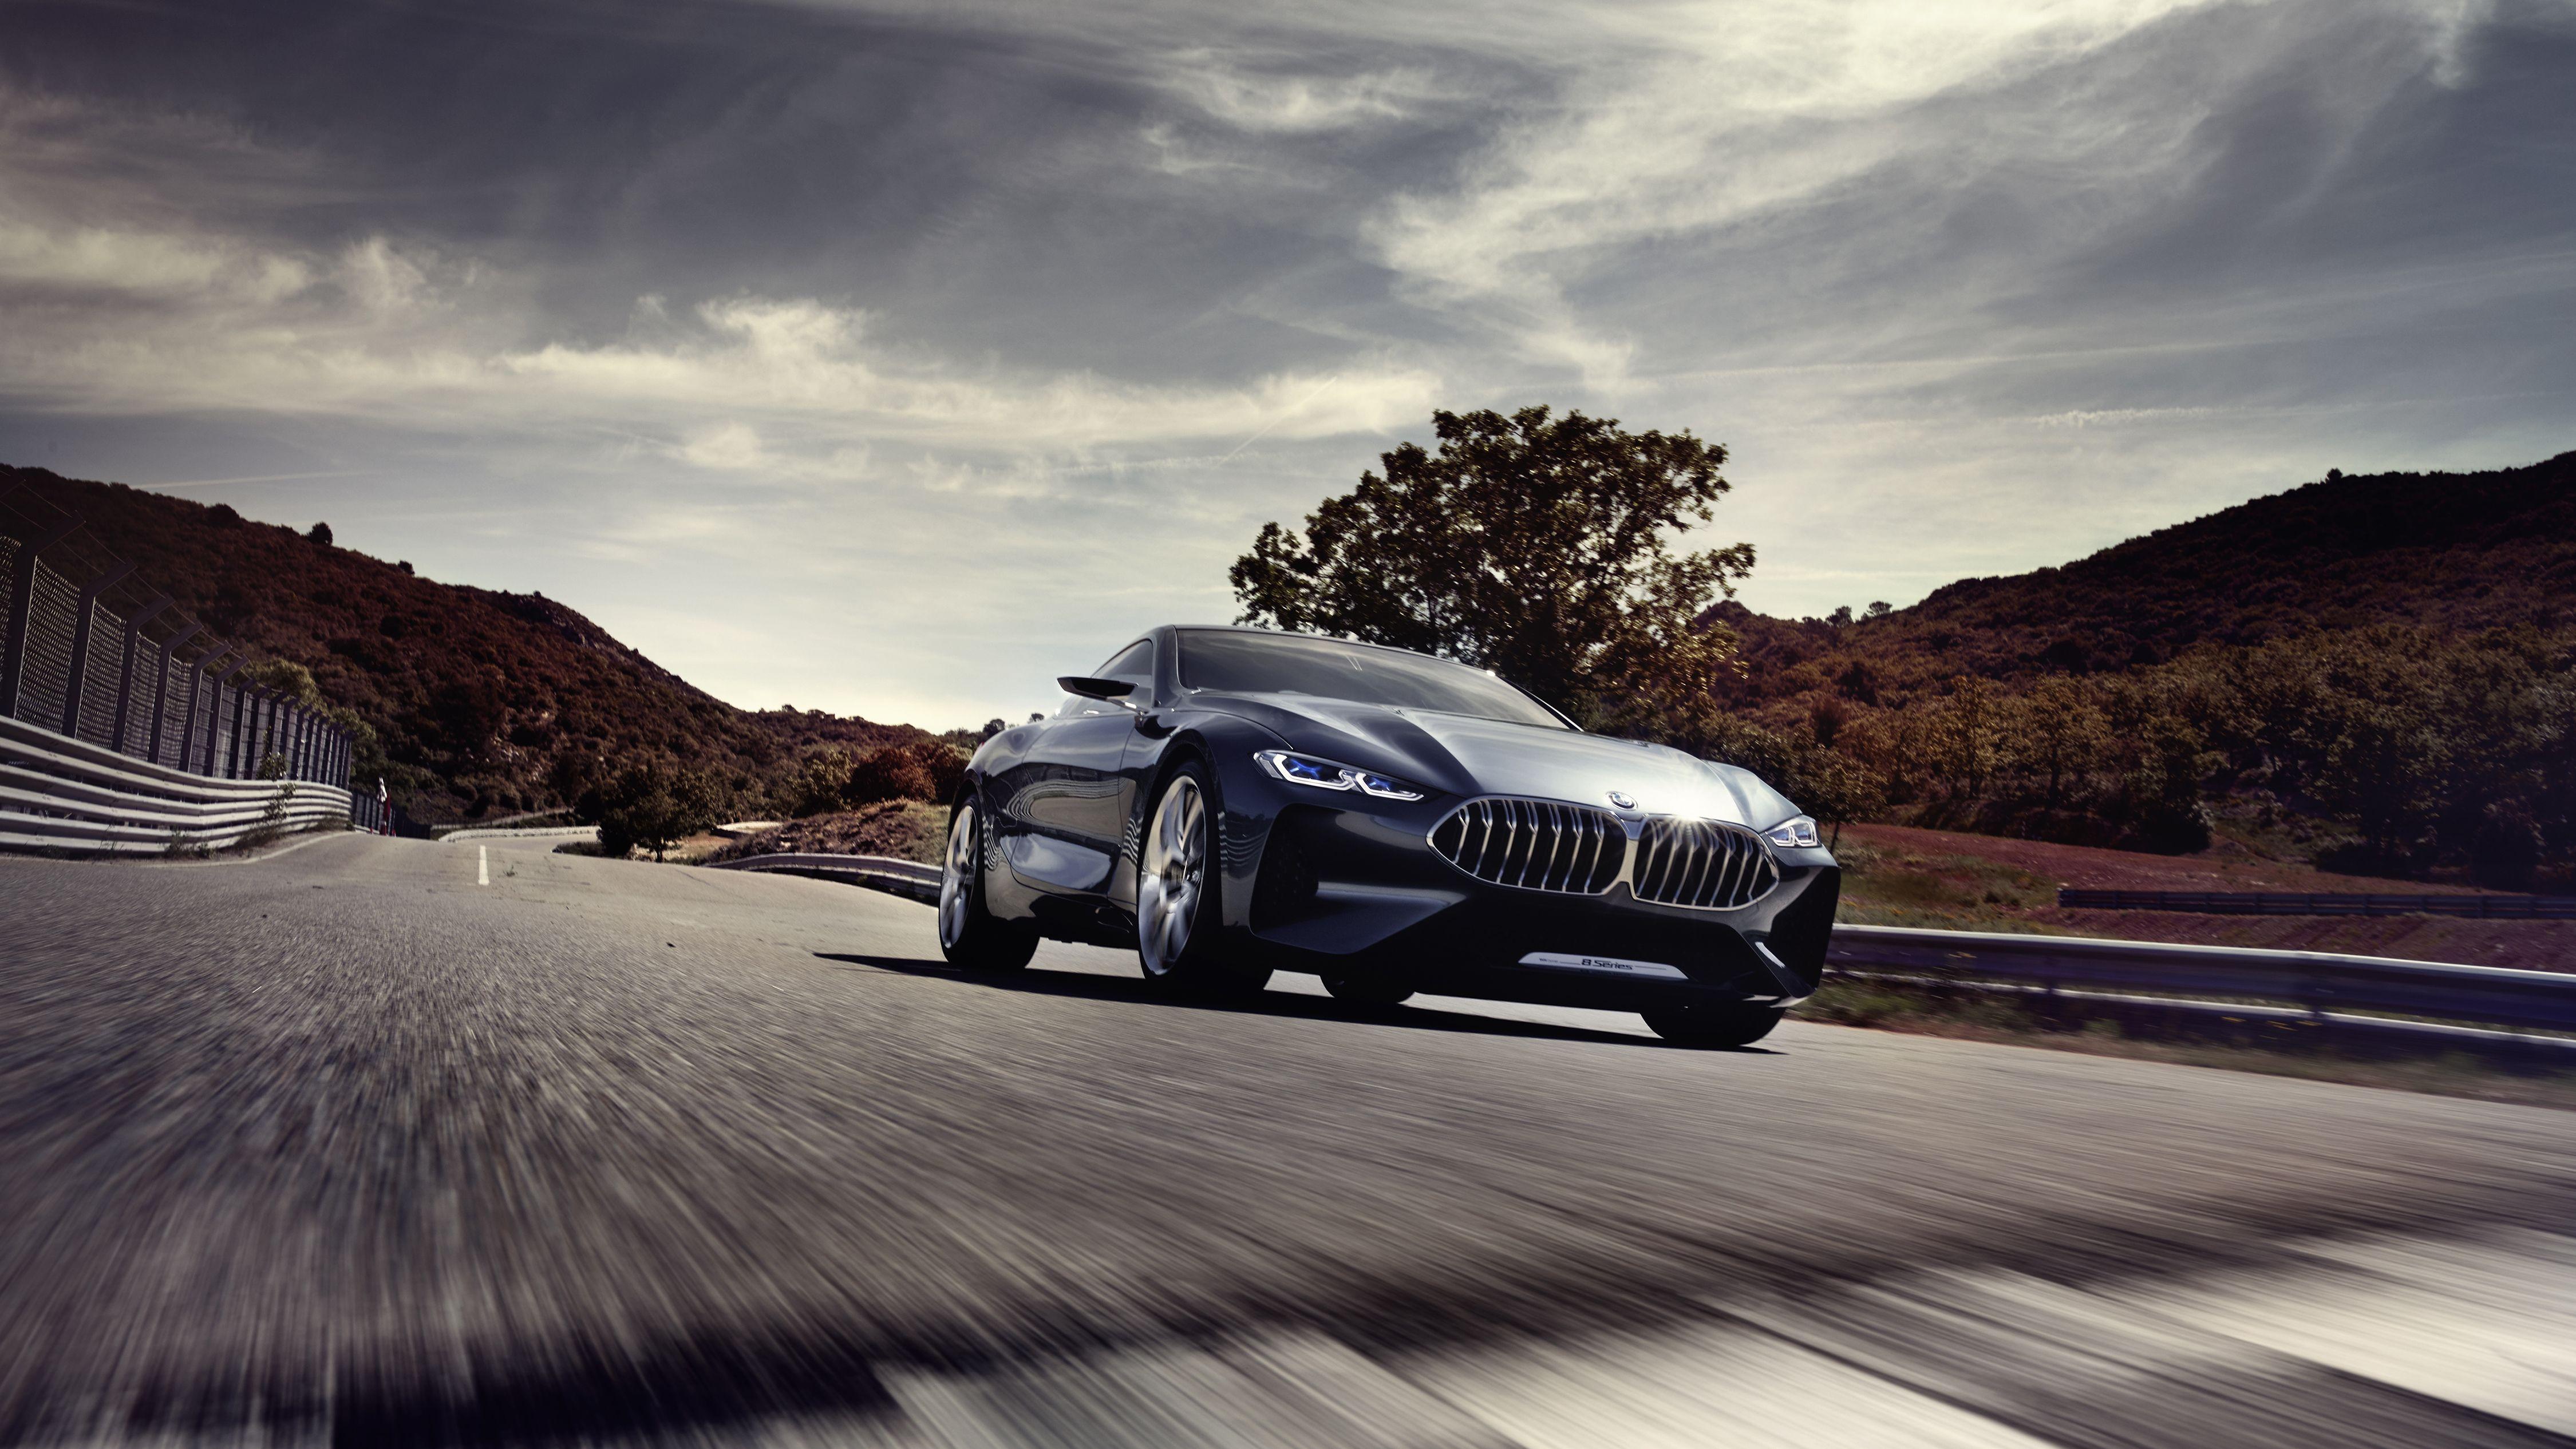 BMW Concept 8 Series 2017 | BMW | Pinterest | Bmw concept and BMW